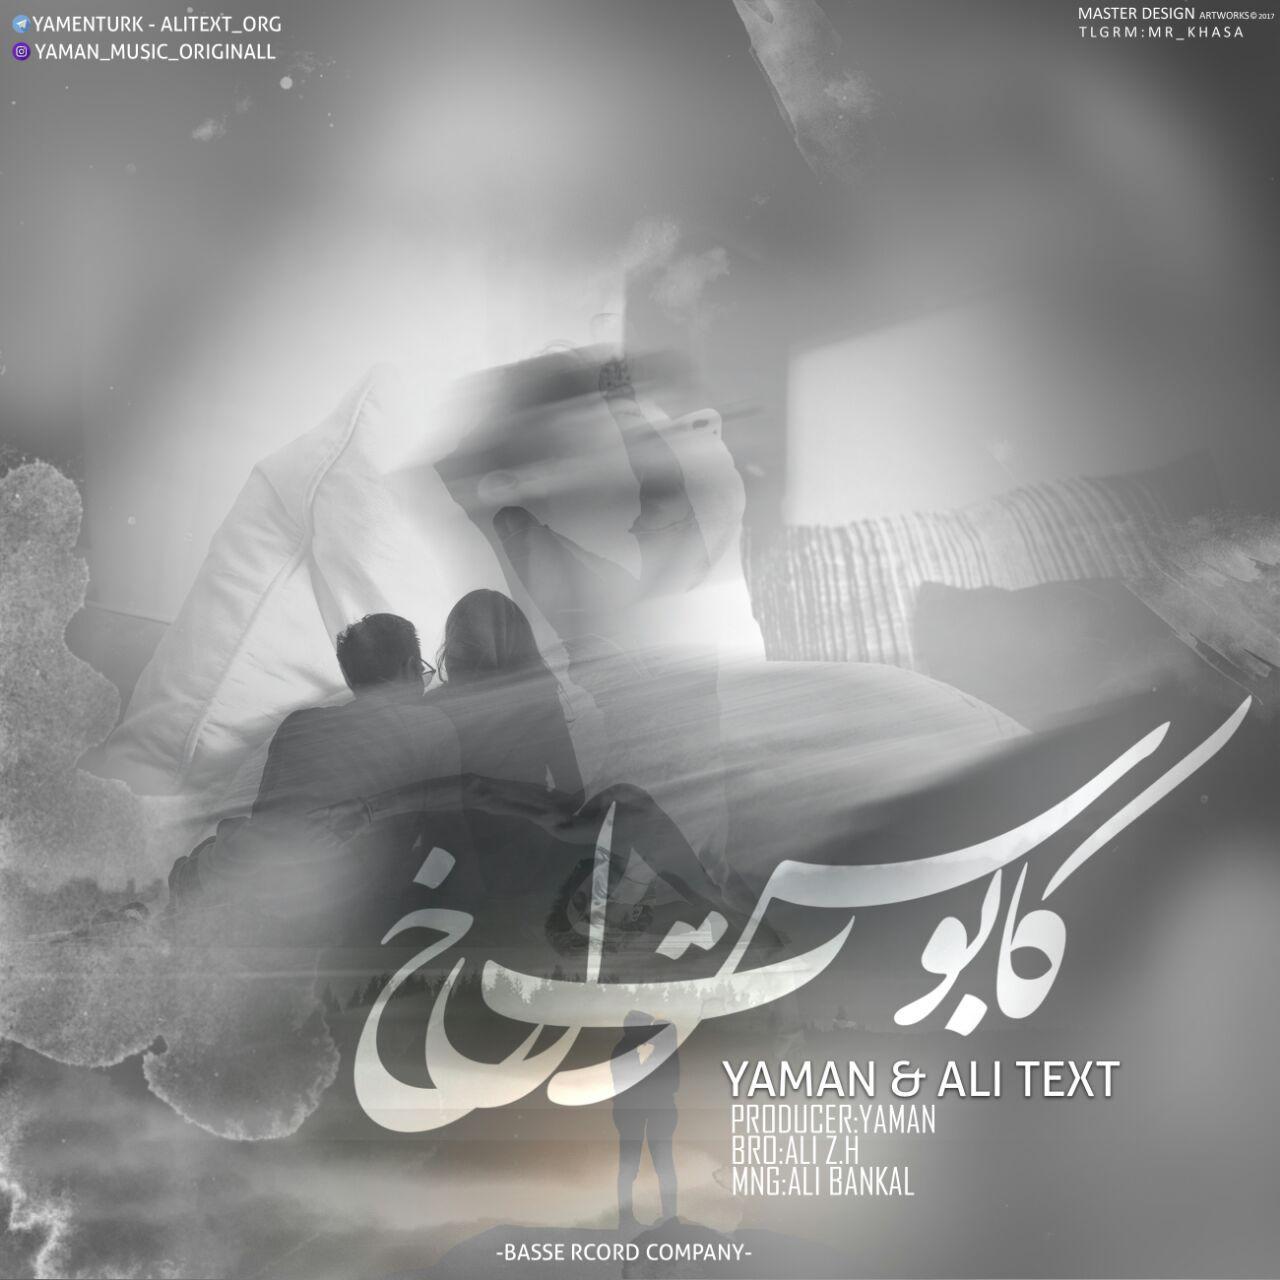 http://s9.picofile.com/file/8312719192/26Ali_Text_Yaman_Kaboose_Talkh.jpg